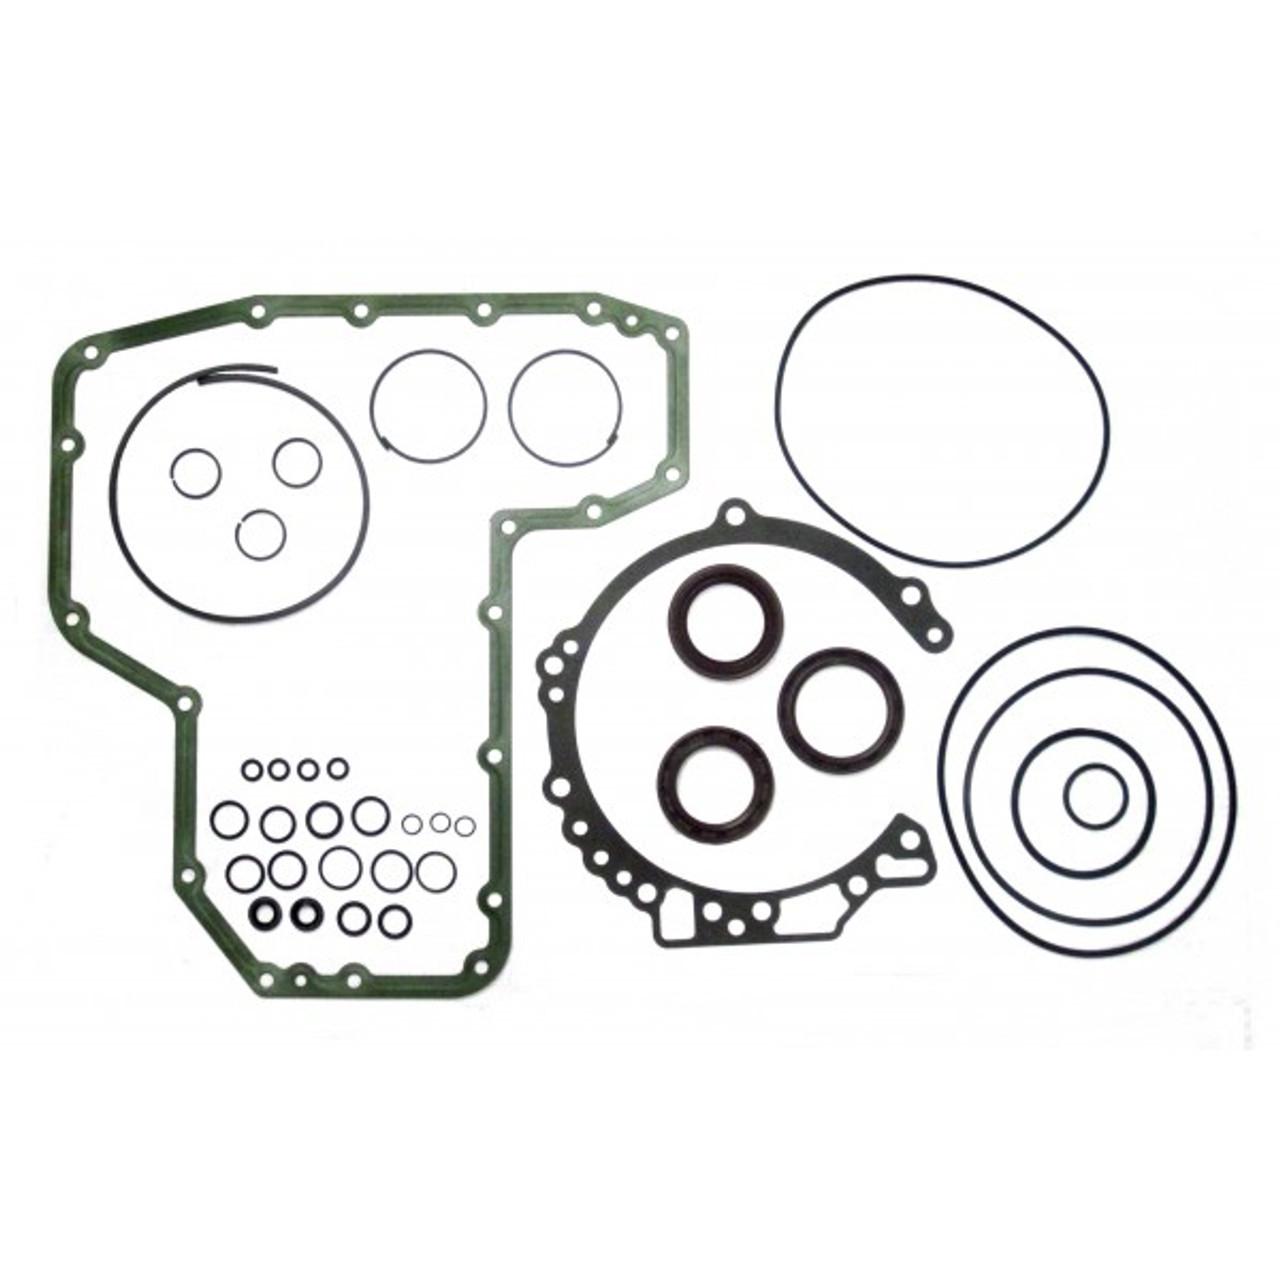 REOF08A(JF009) Overhaul kit